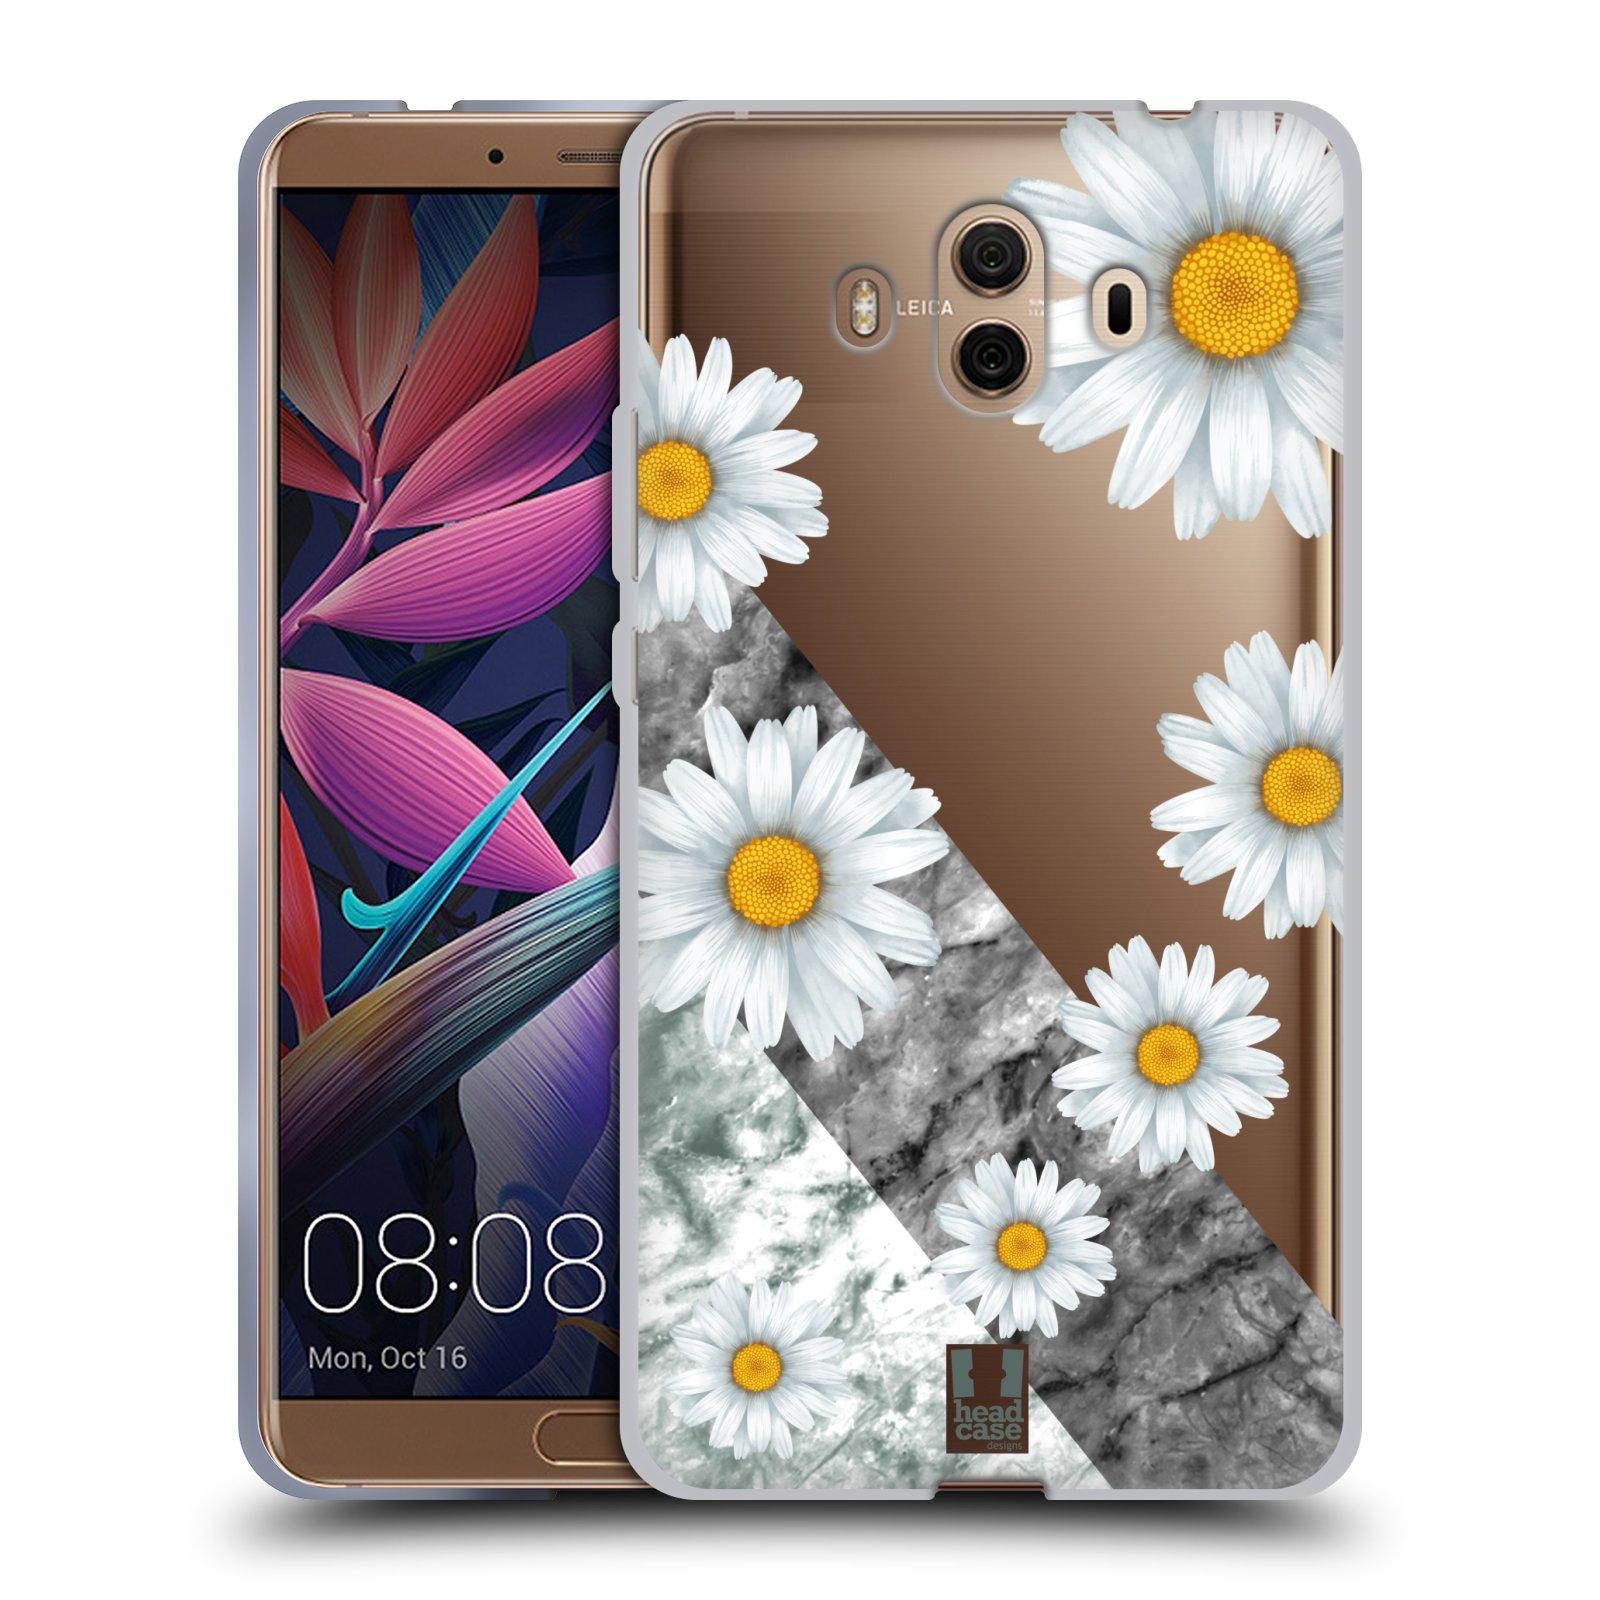 Silikonové pouzdro na mobil Huawei Mate 10 - Head Case - Kopretiny a mramor